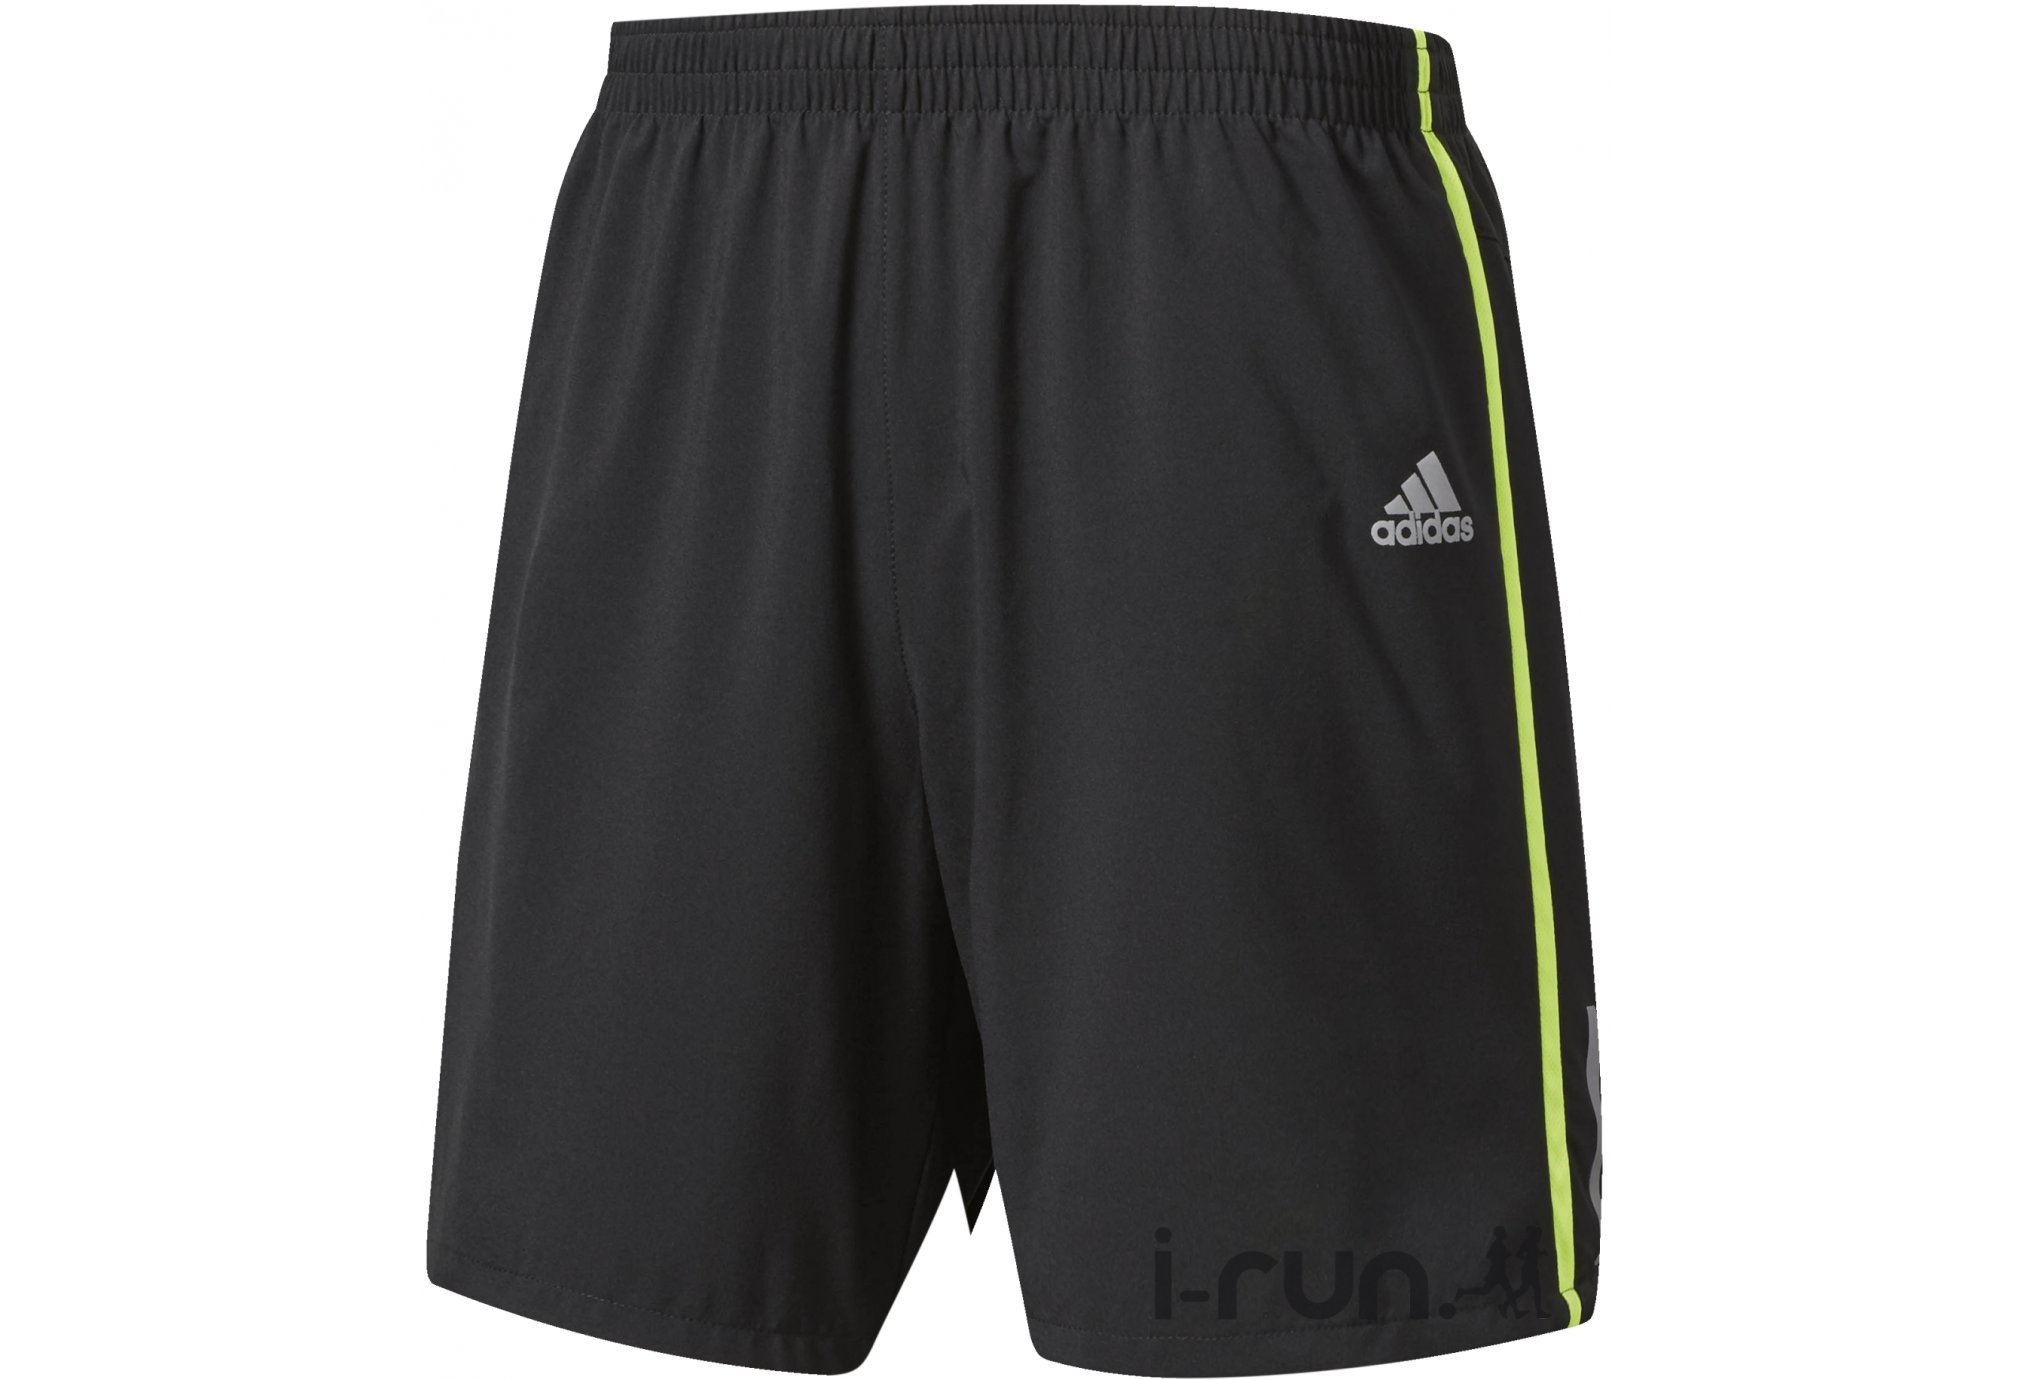 Adidas Response 5-Inch m vêtement running homme